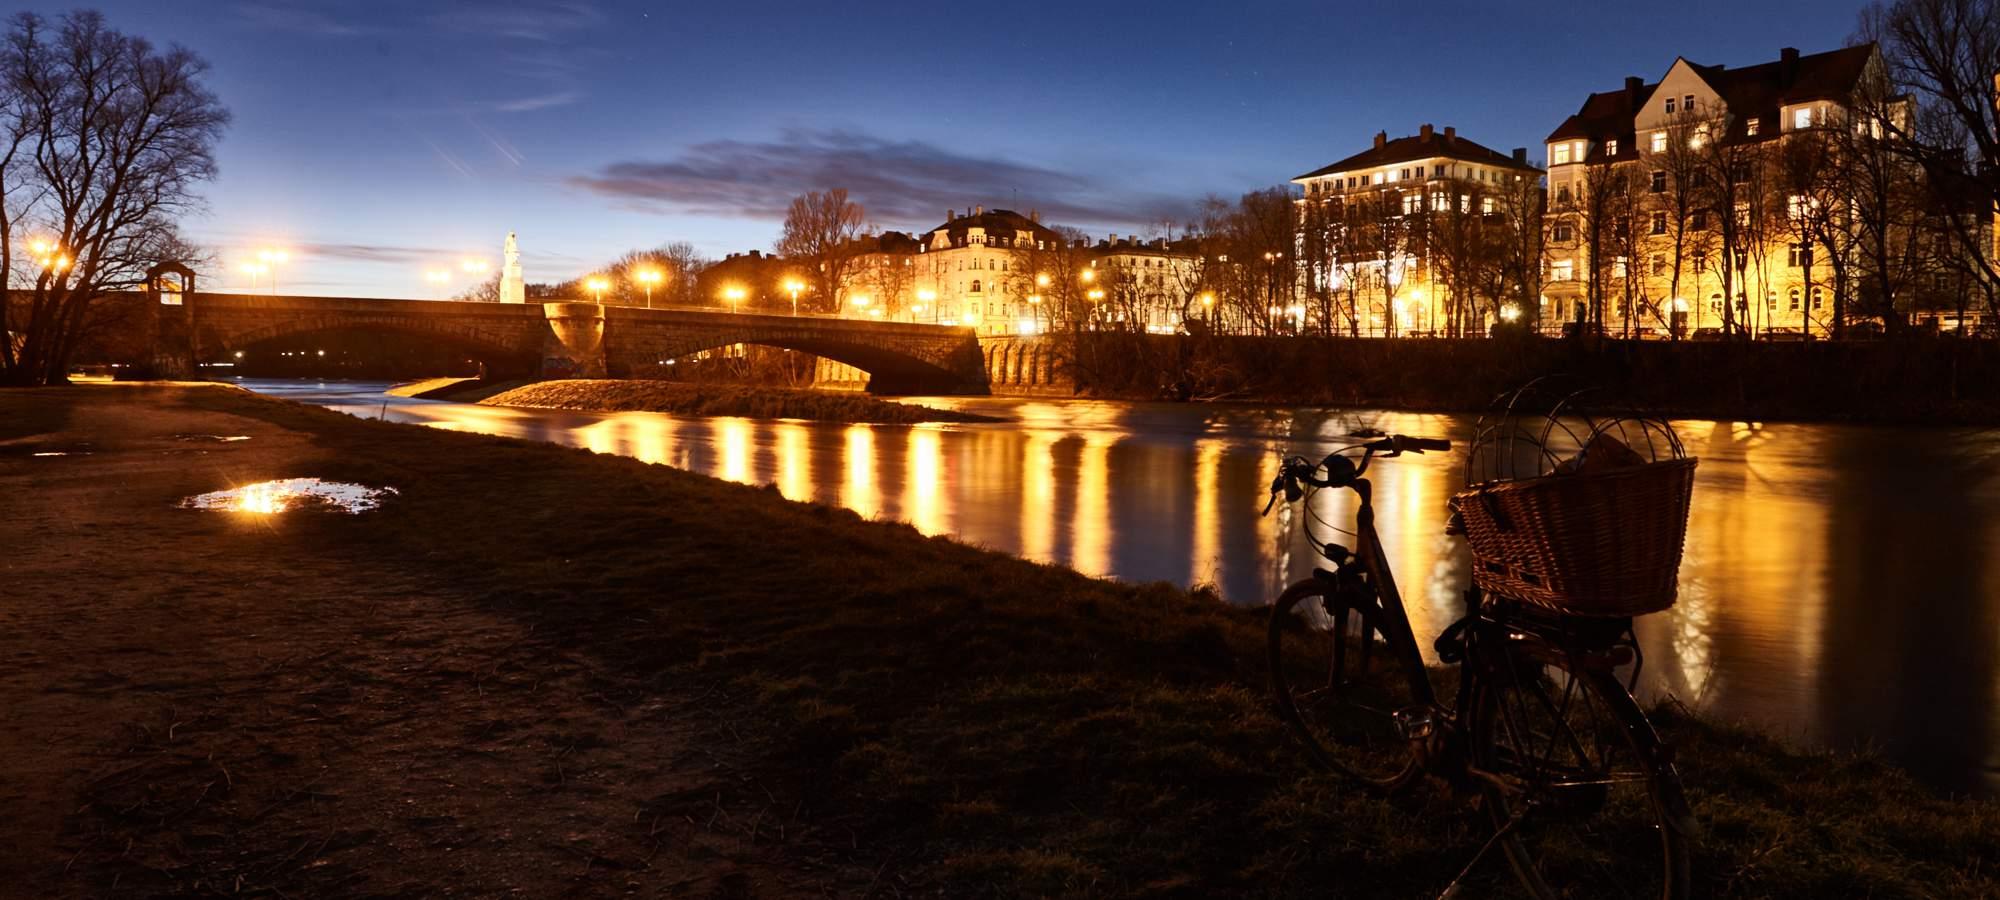 Isar-Ufer-Abend-Rad